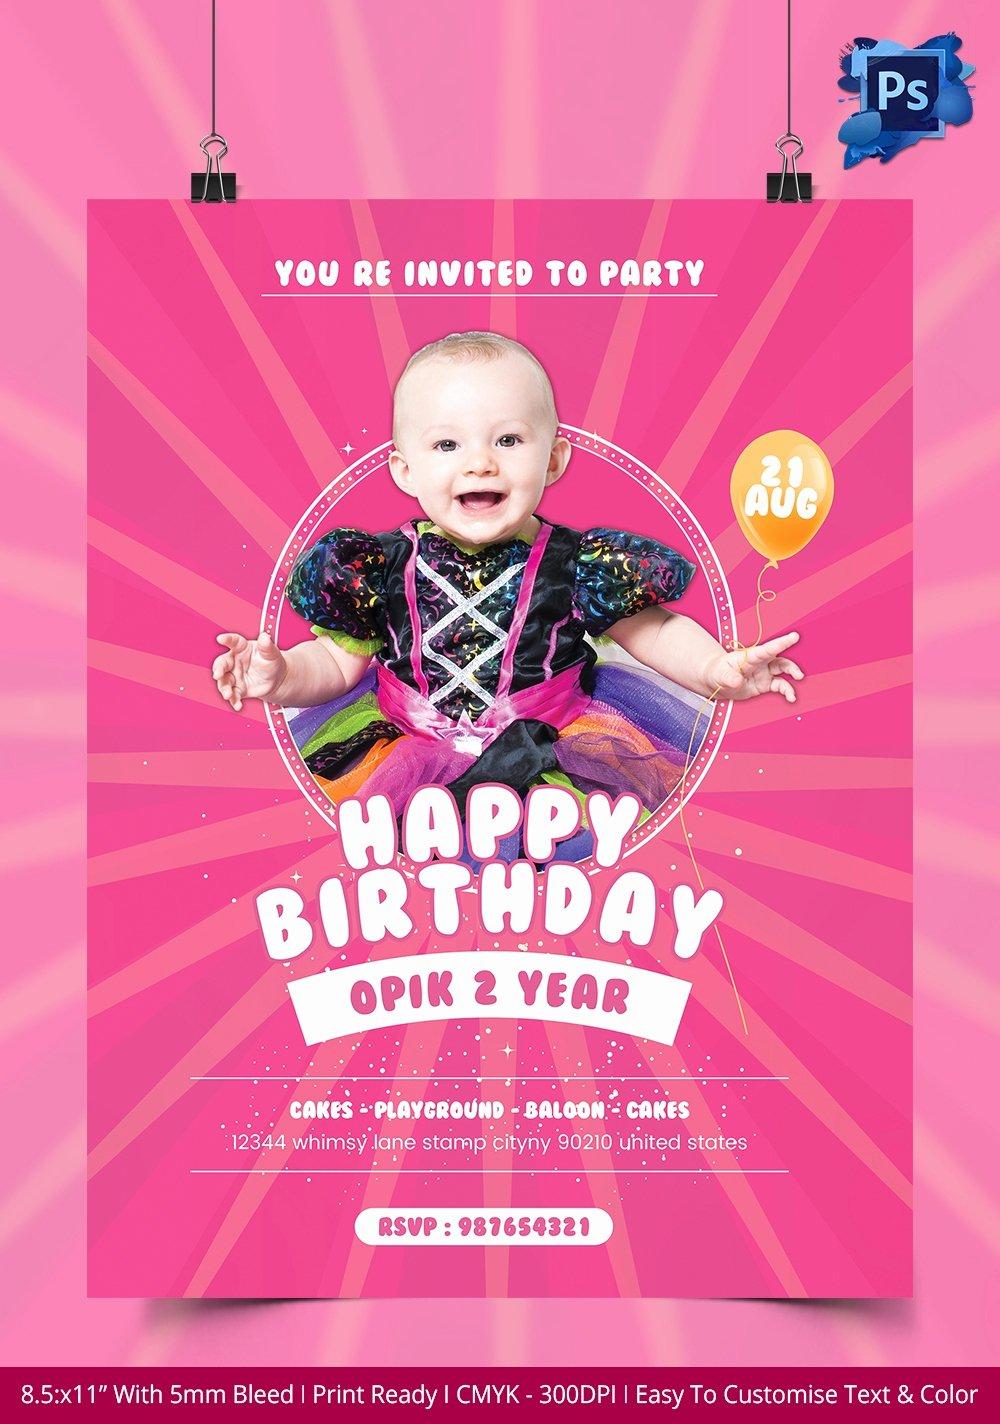 Birthday Flyer Template Free Luxury Birthday Flyer Template – 37 Free Psd Ai Vector Eps